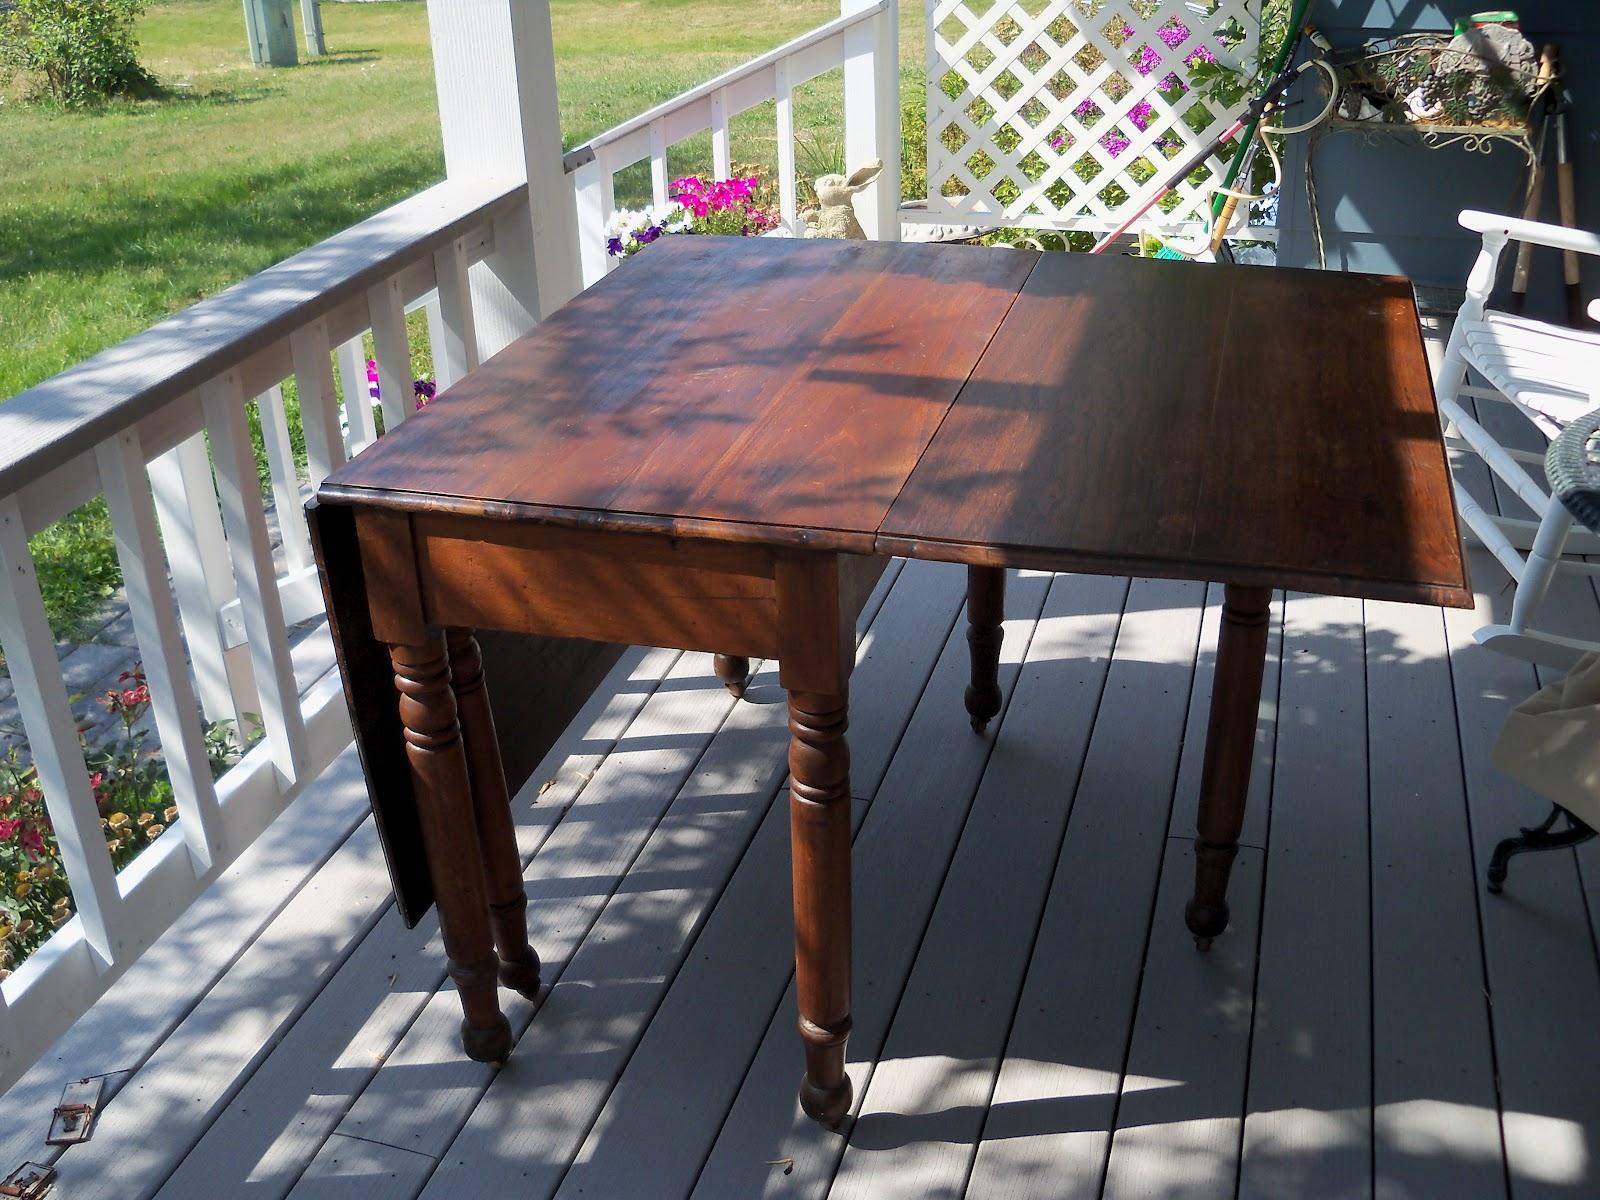 The Pastel Prairie Antique Gateleg Drop Leaf Table